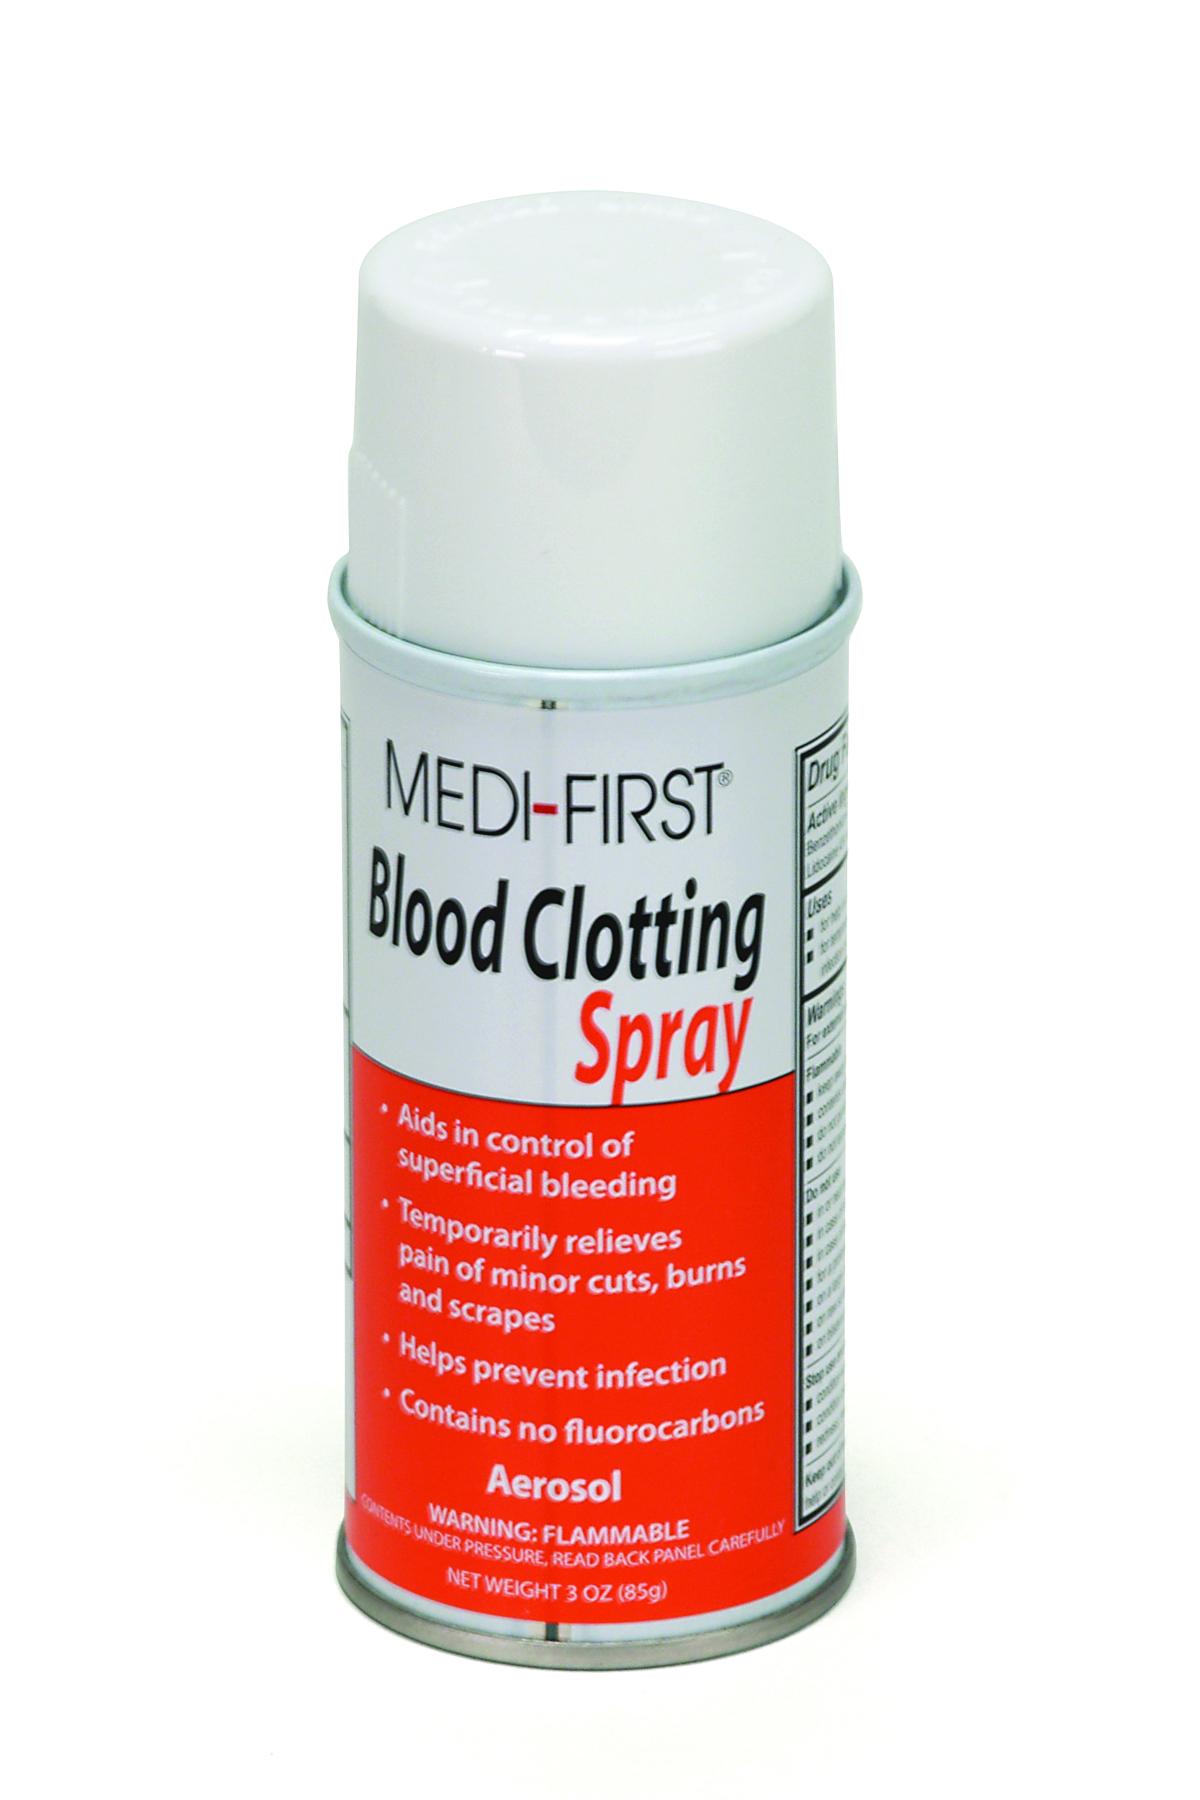 Blood Clotting Spray